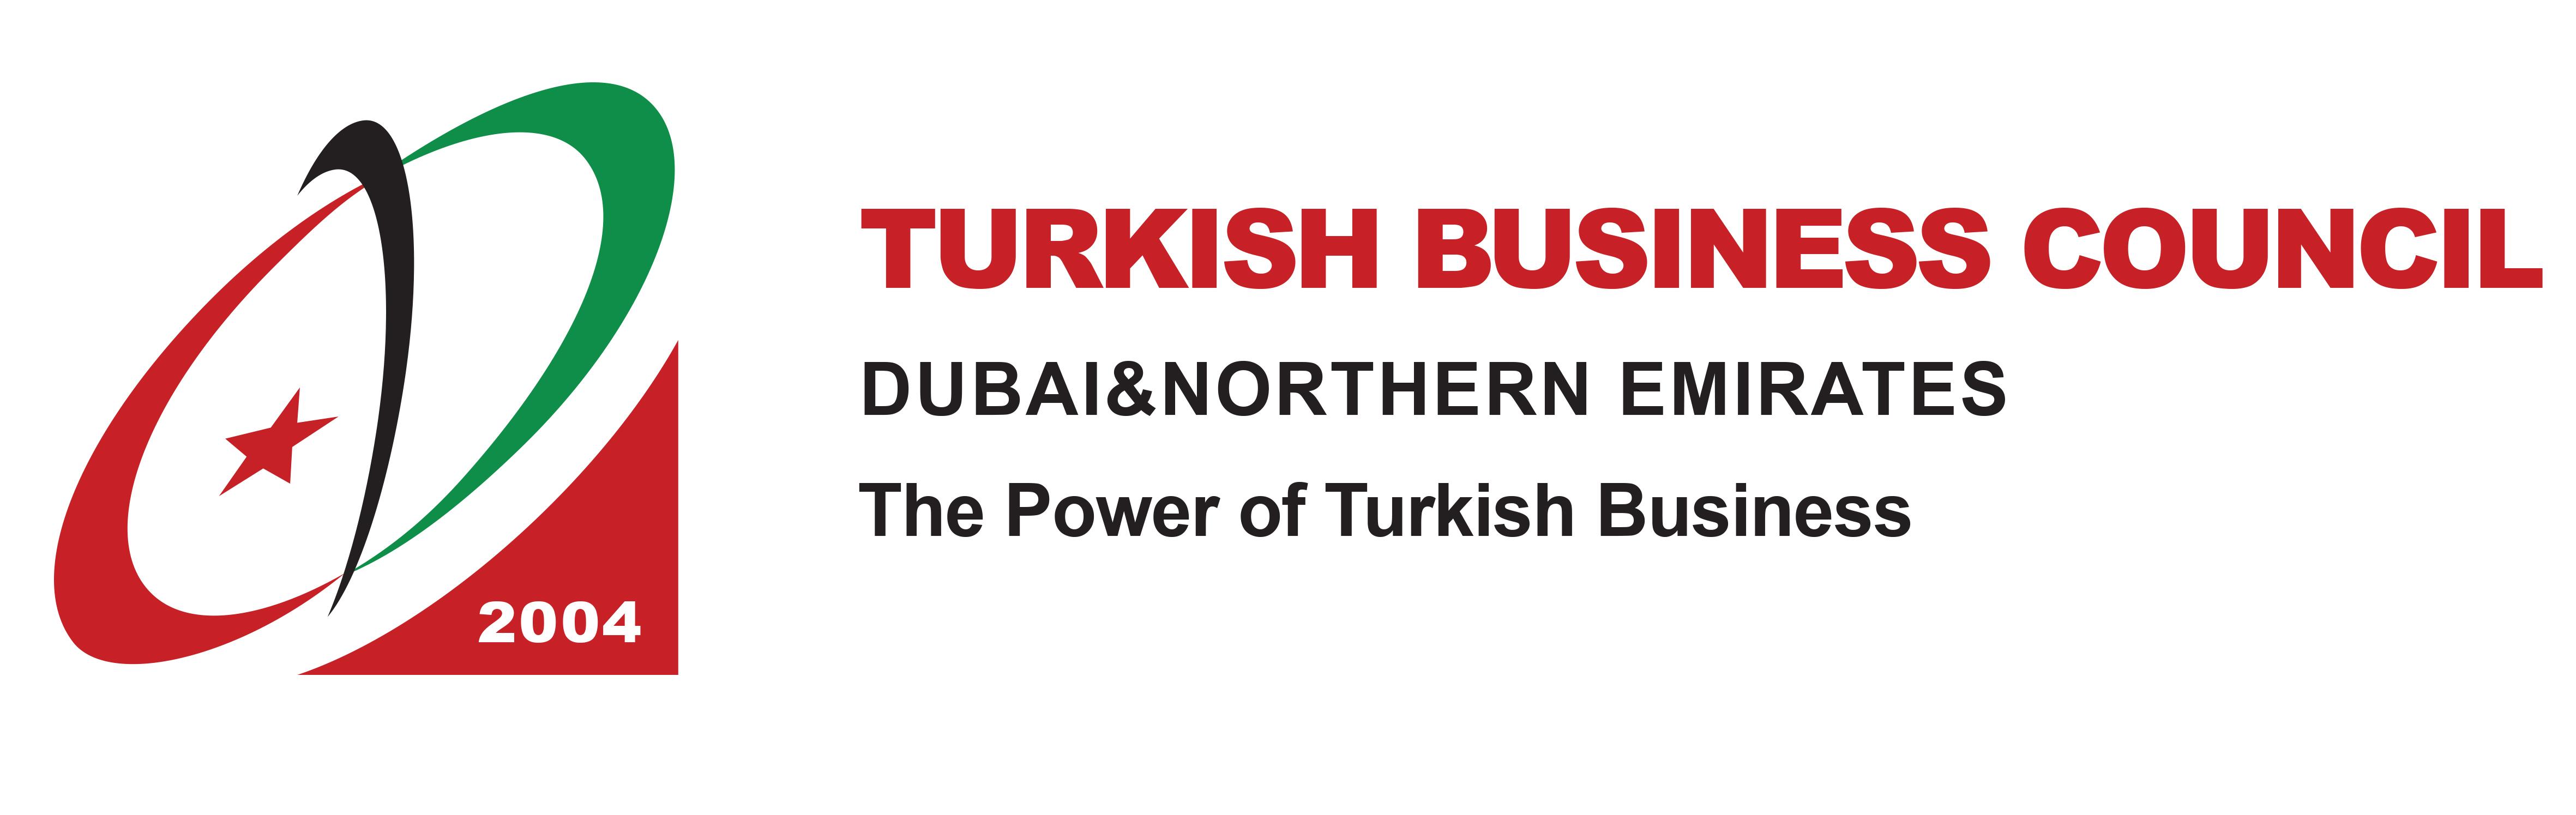 Turkish Business Council Logo